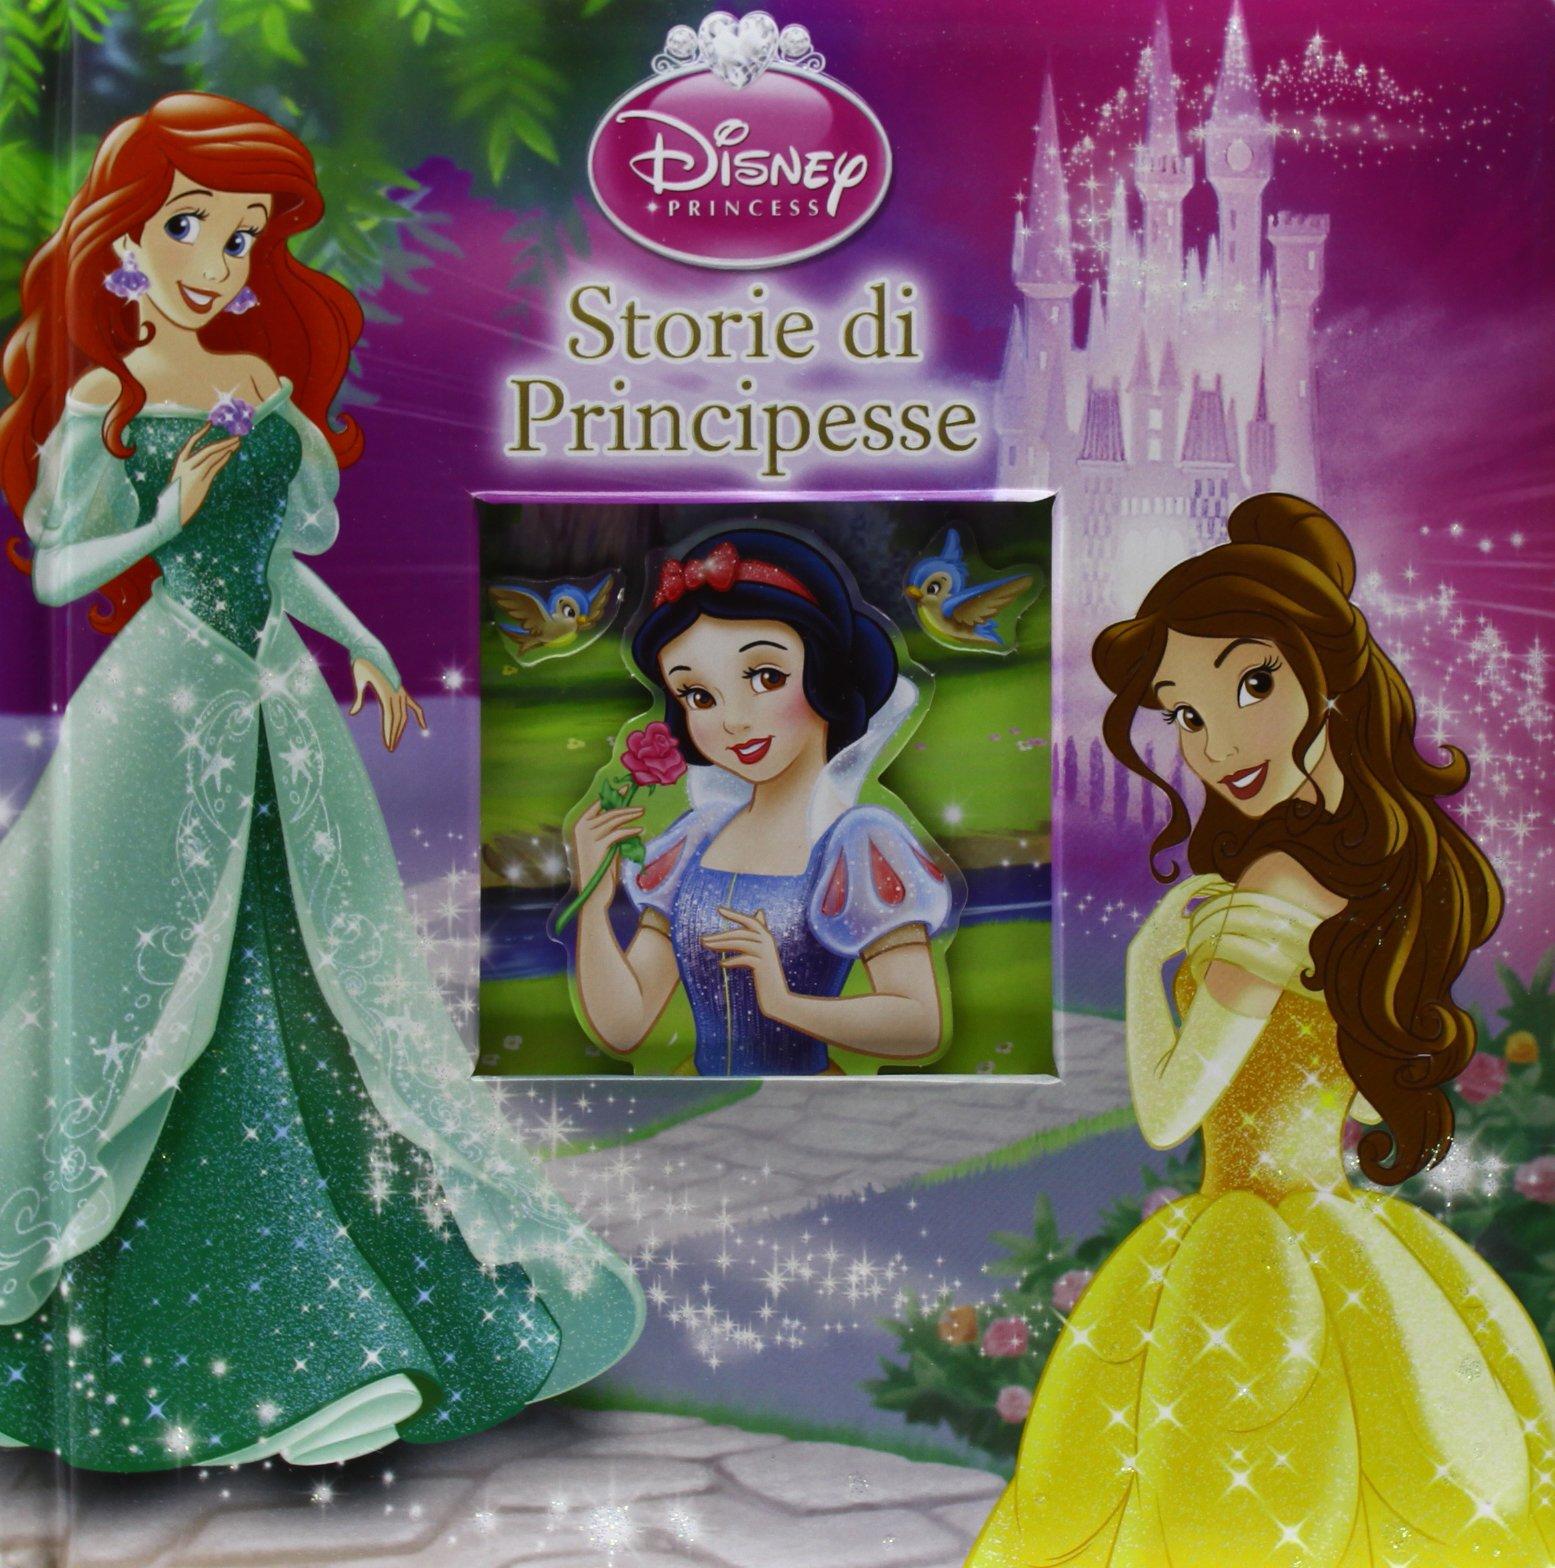 Ben noto Amazon.it: Storie di principesse. Disney princess - - Libri HJ59